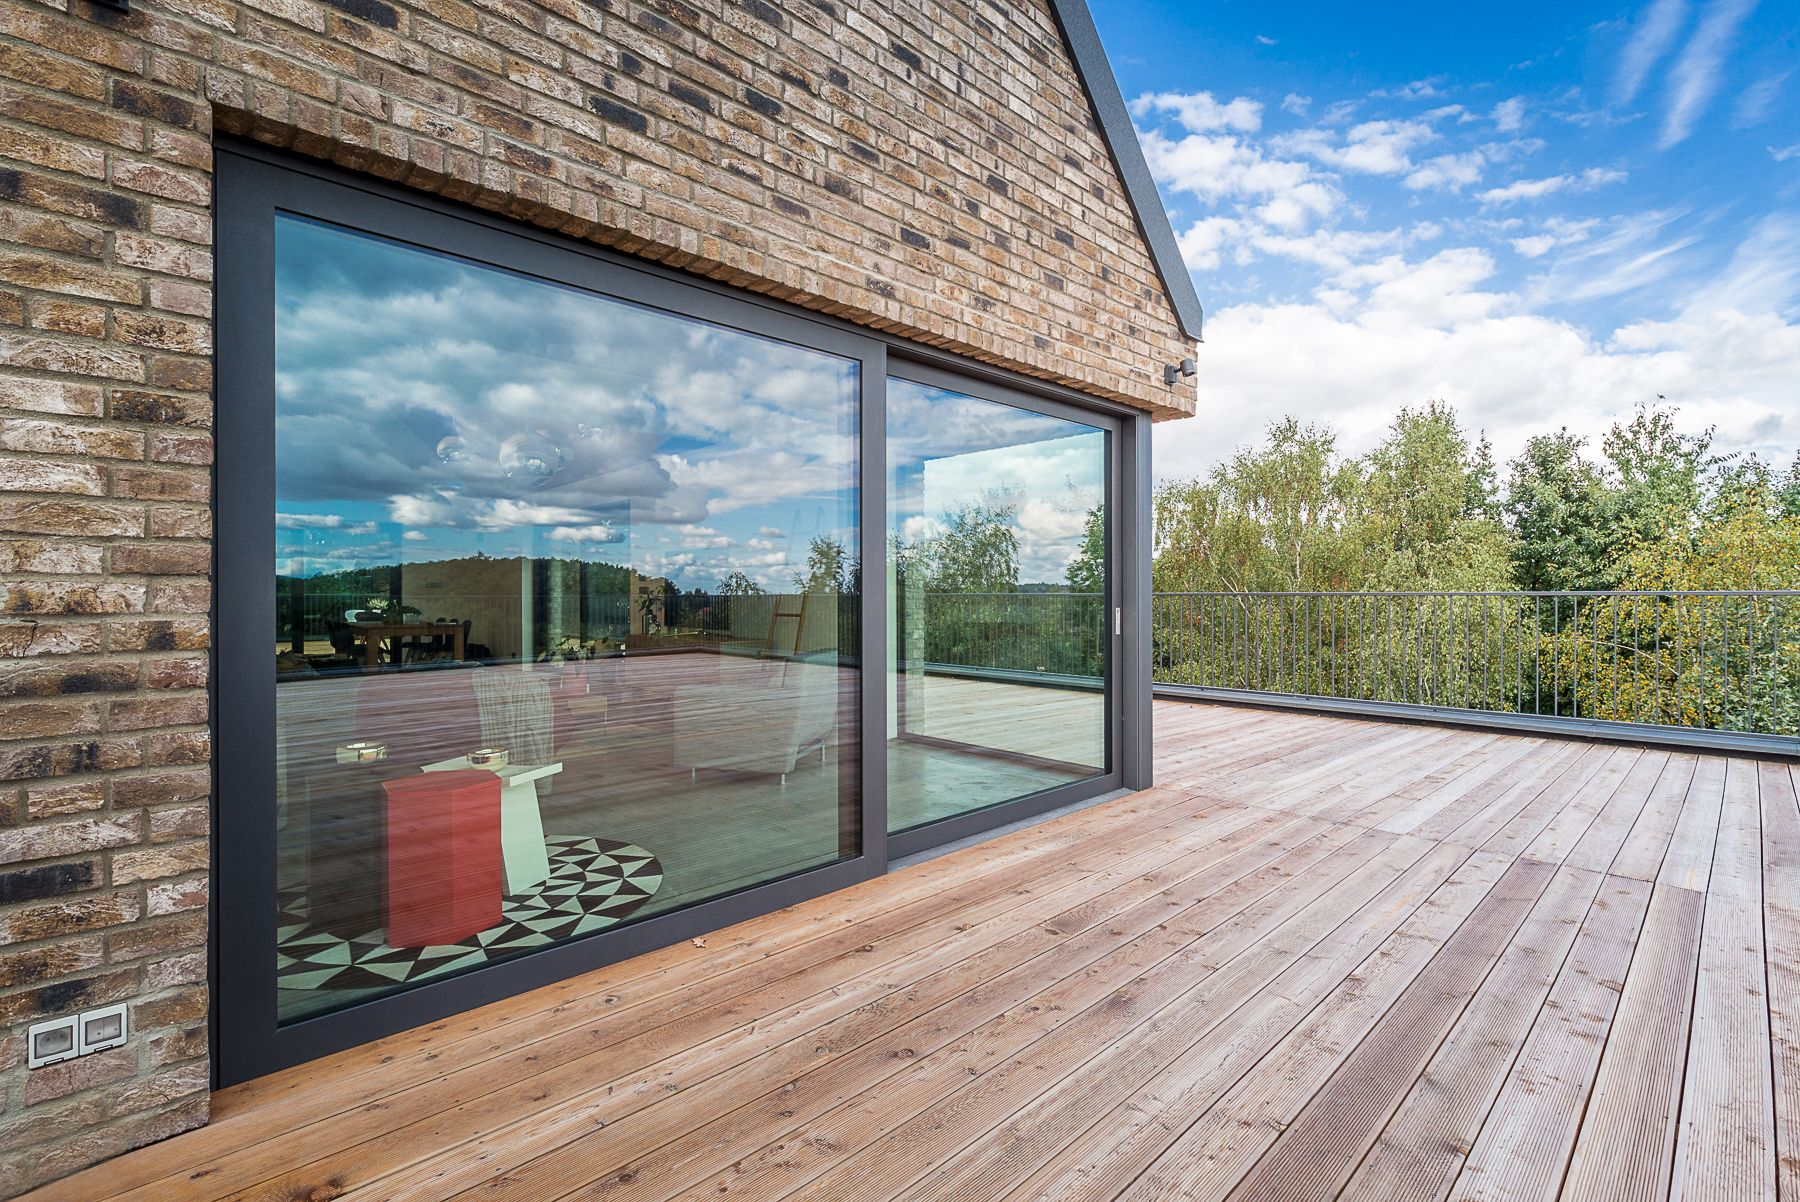 une jolie façade de maison grâce au contraste de la baie vitrée